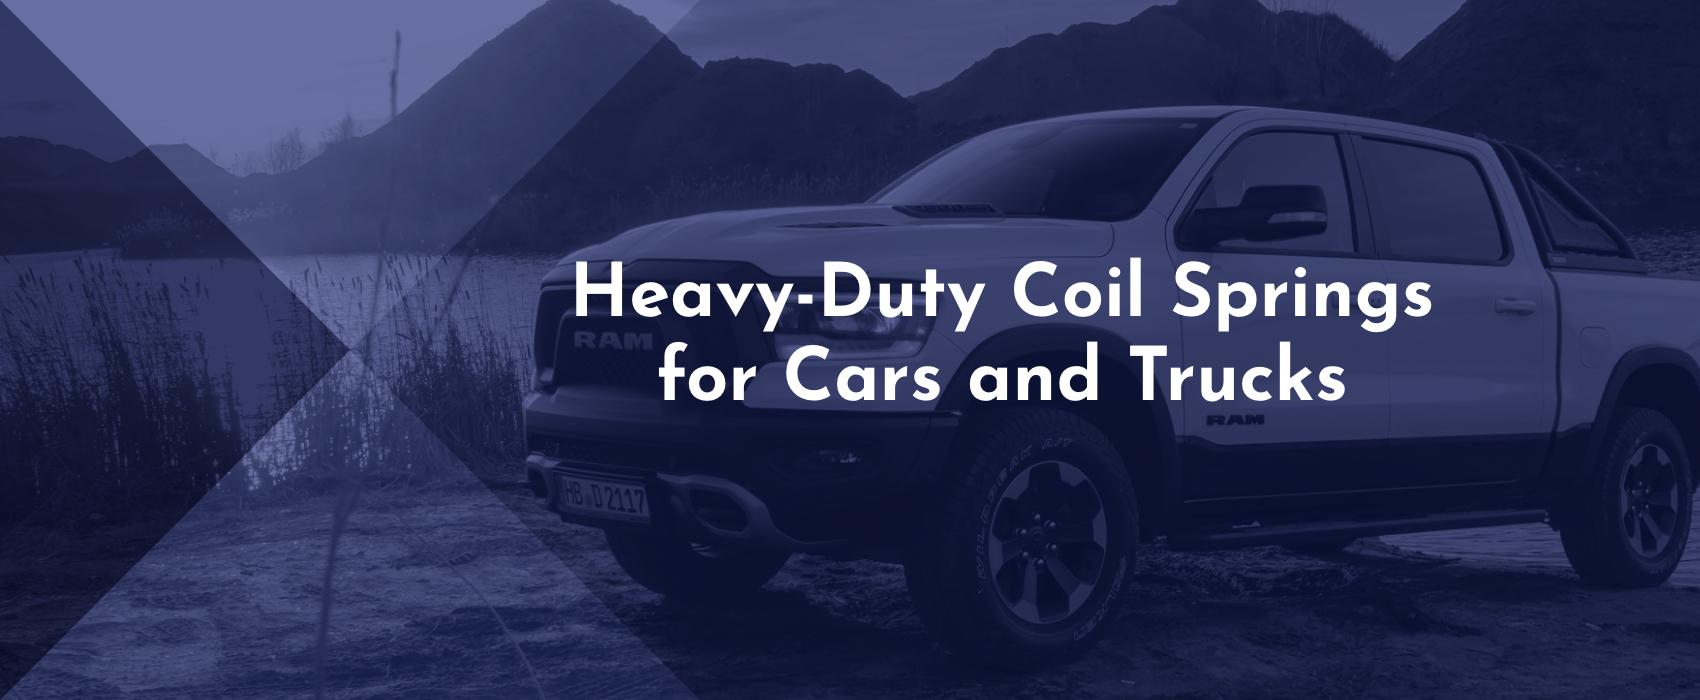 01-heavyduty-coil-springs-for-cars-and-trucks.jpg